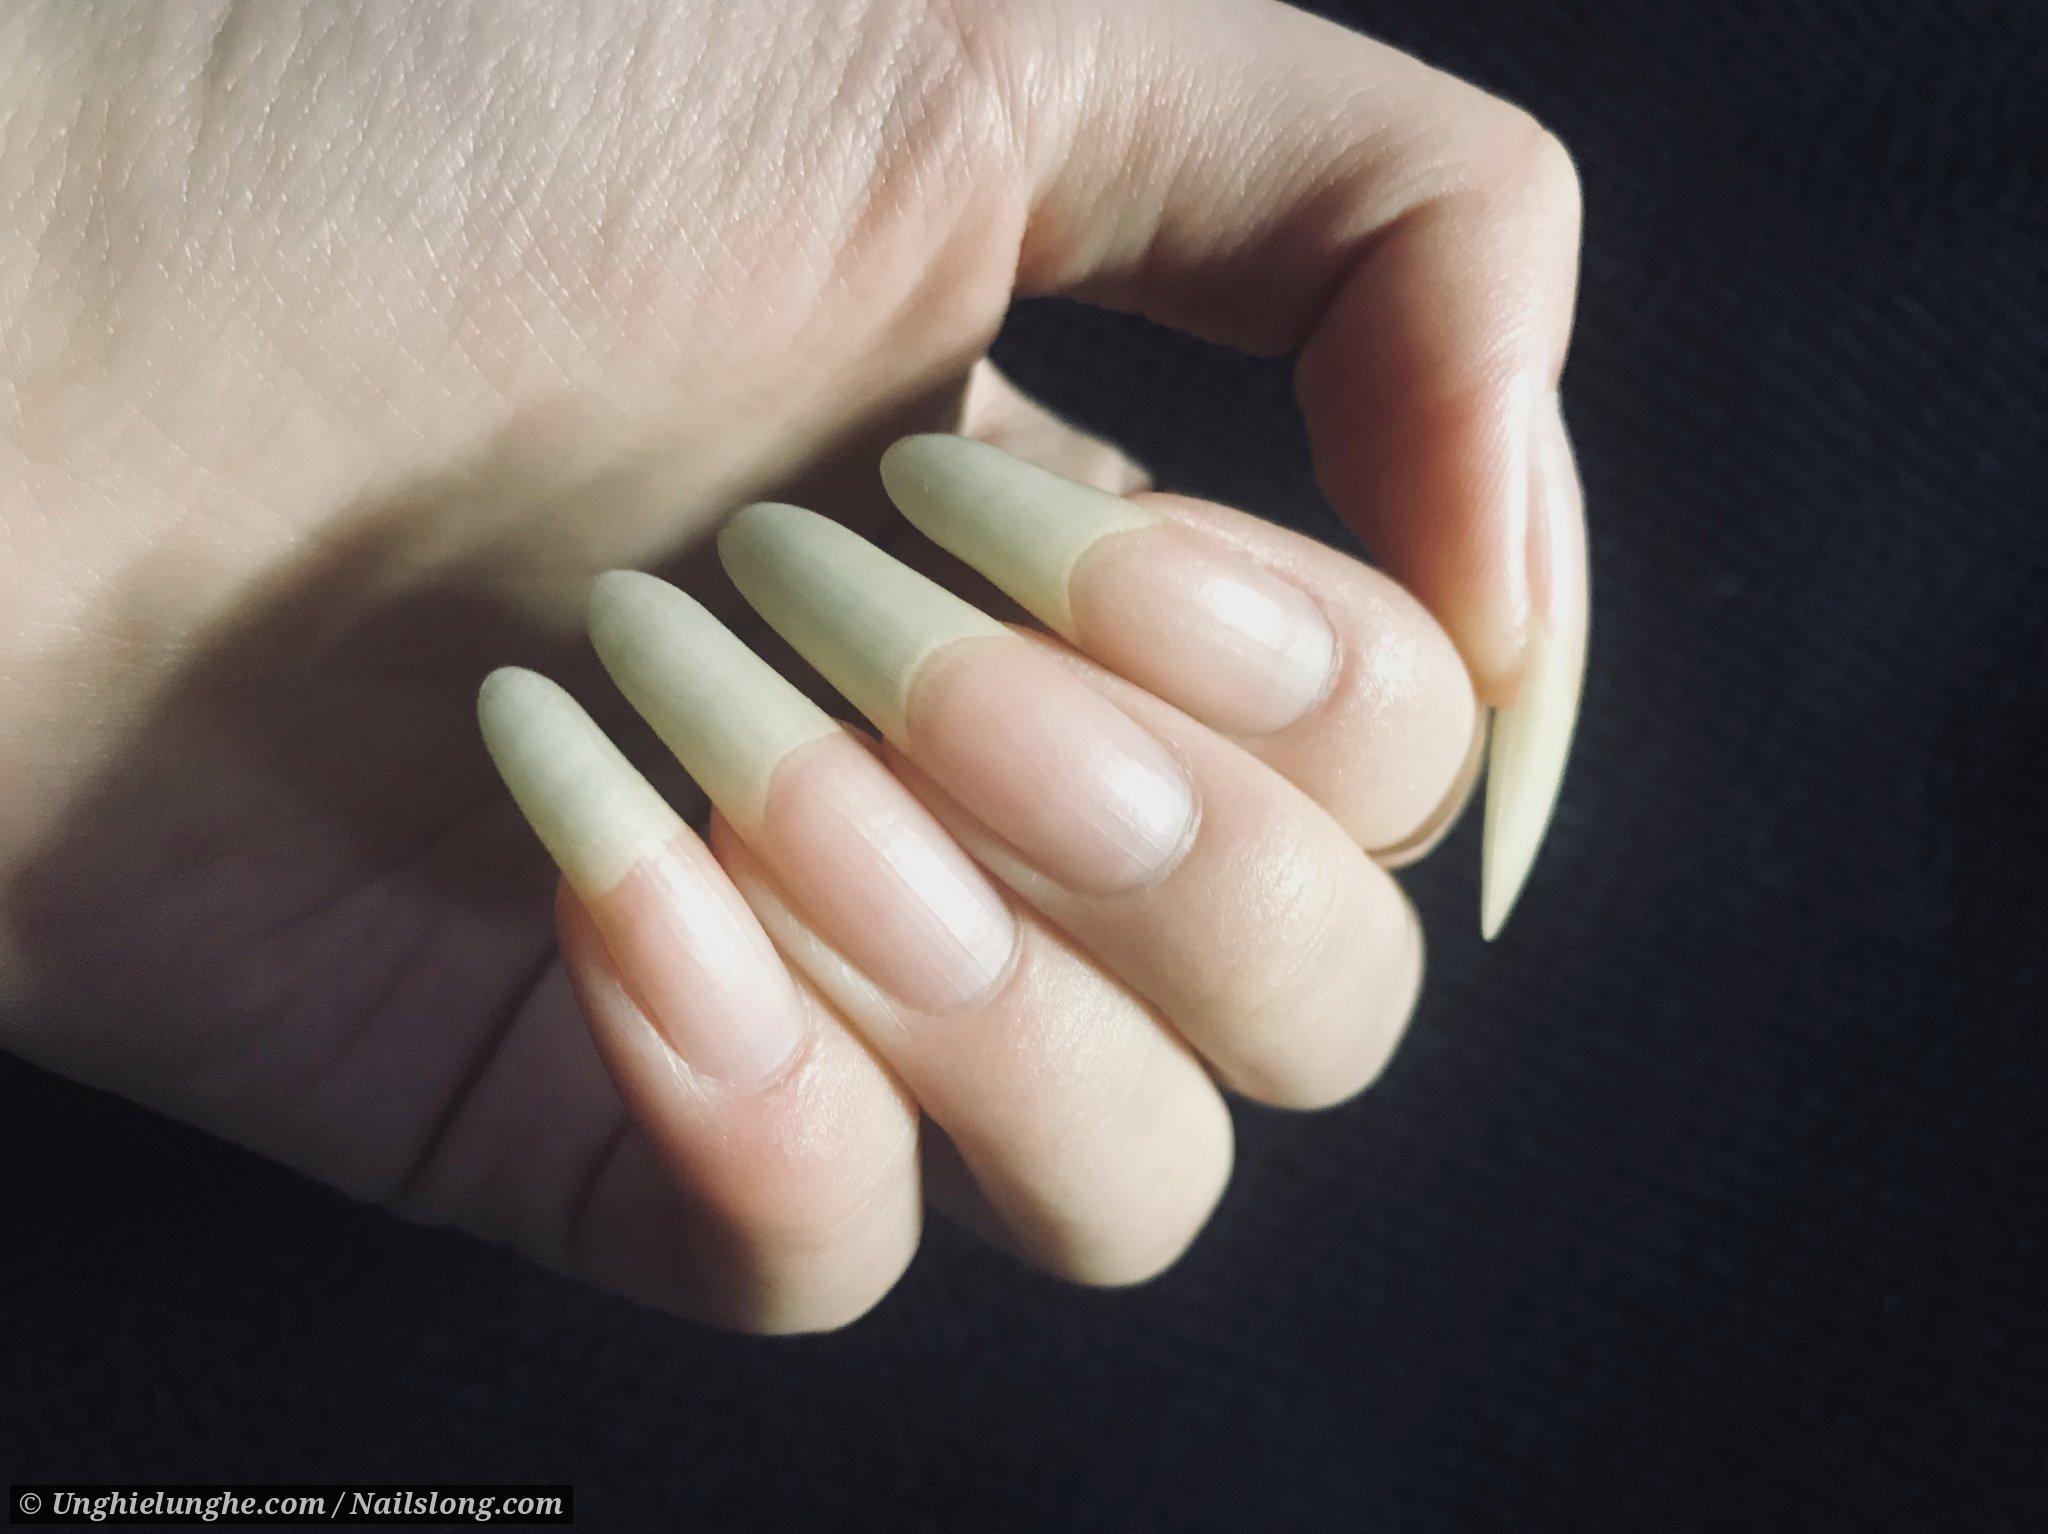 Beryl - Nailslong.com